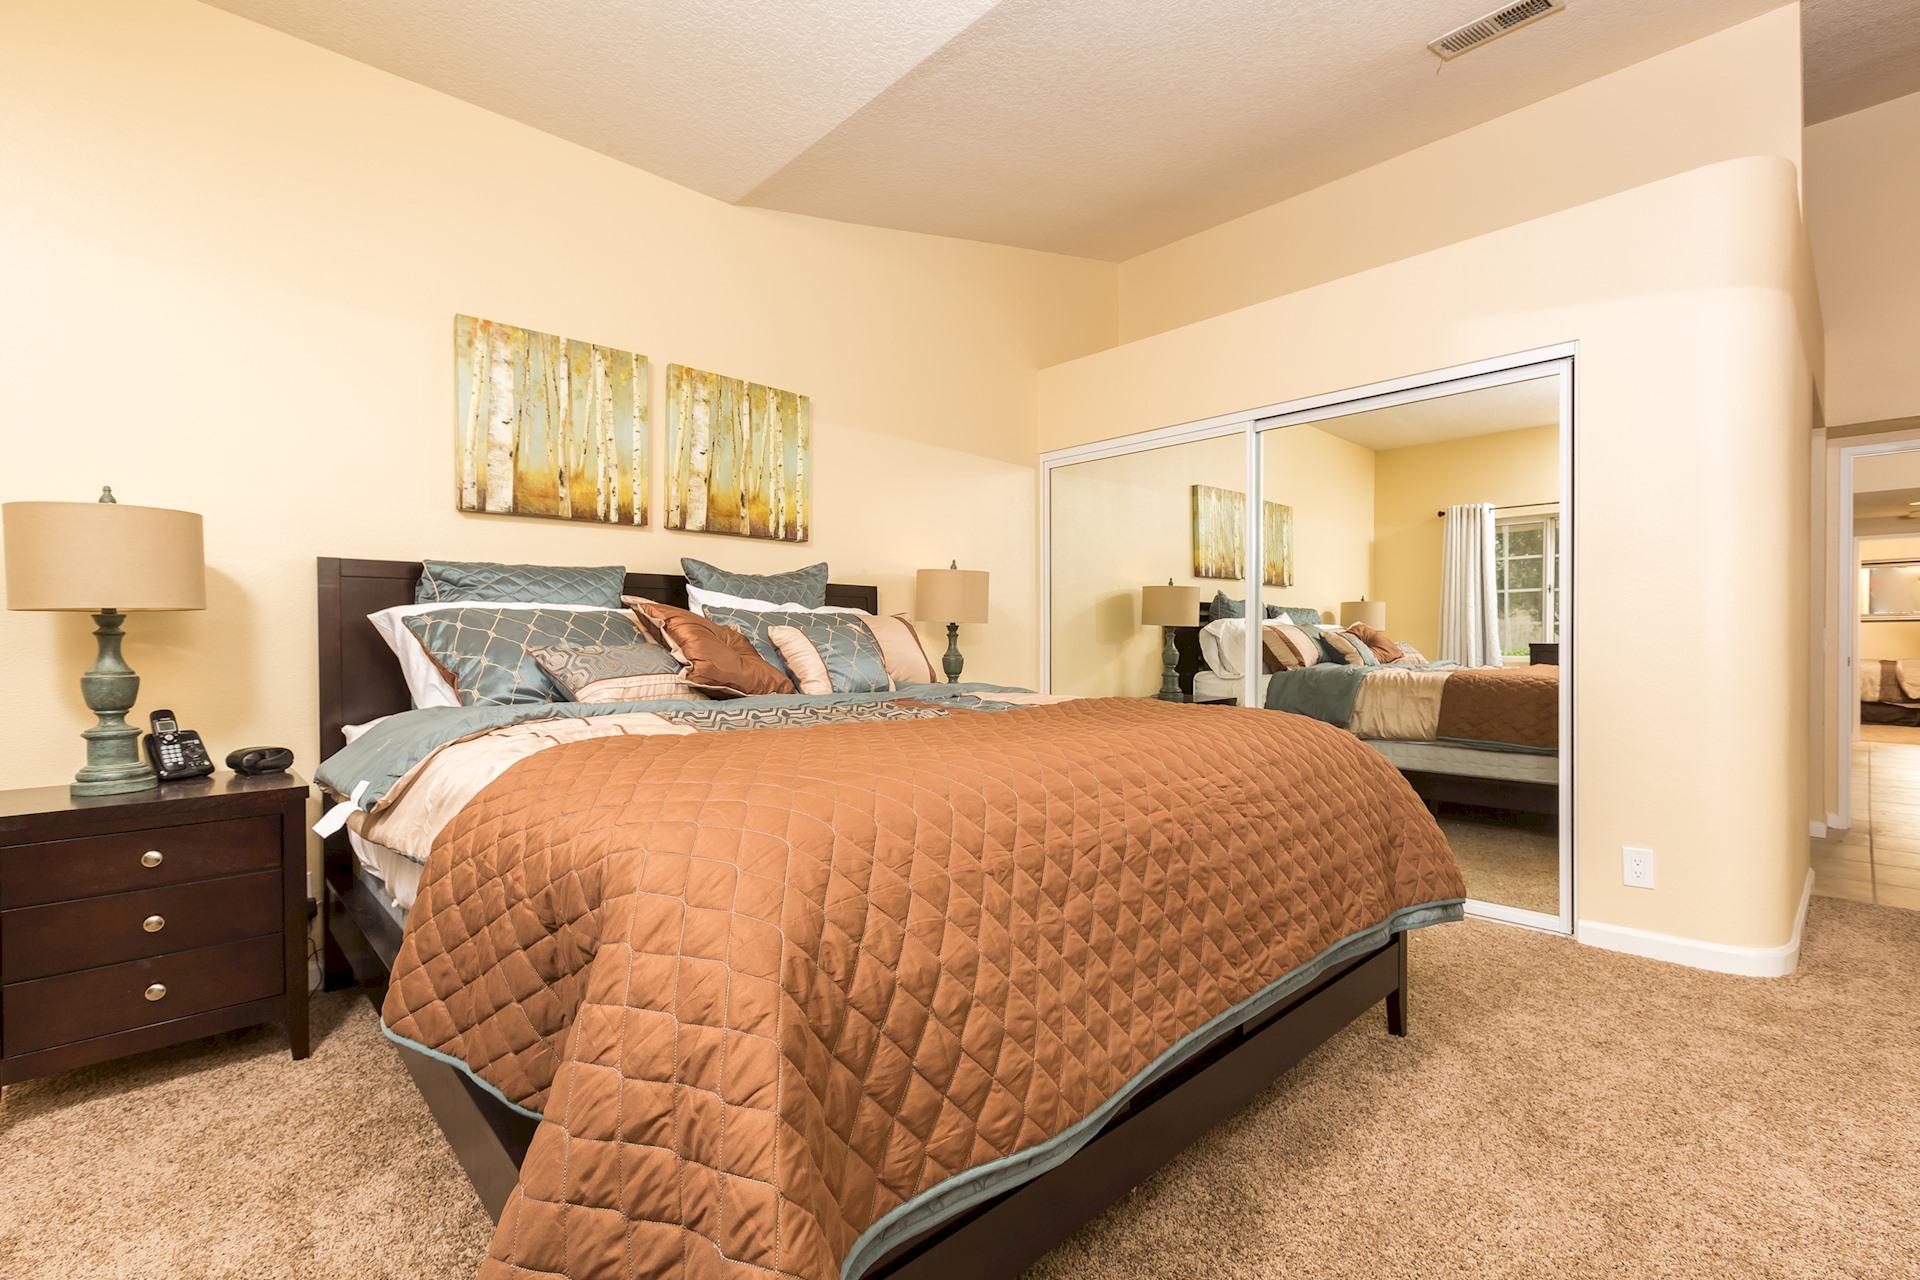 Apartment PALM DESERT LUXURY VIP HOME w POOL DESERT PARADISE photo 20243290